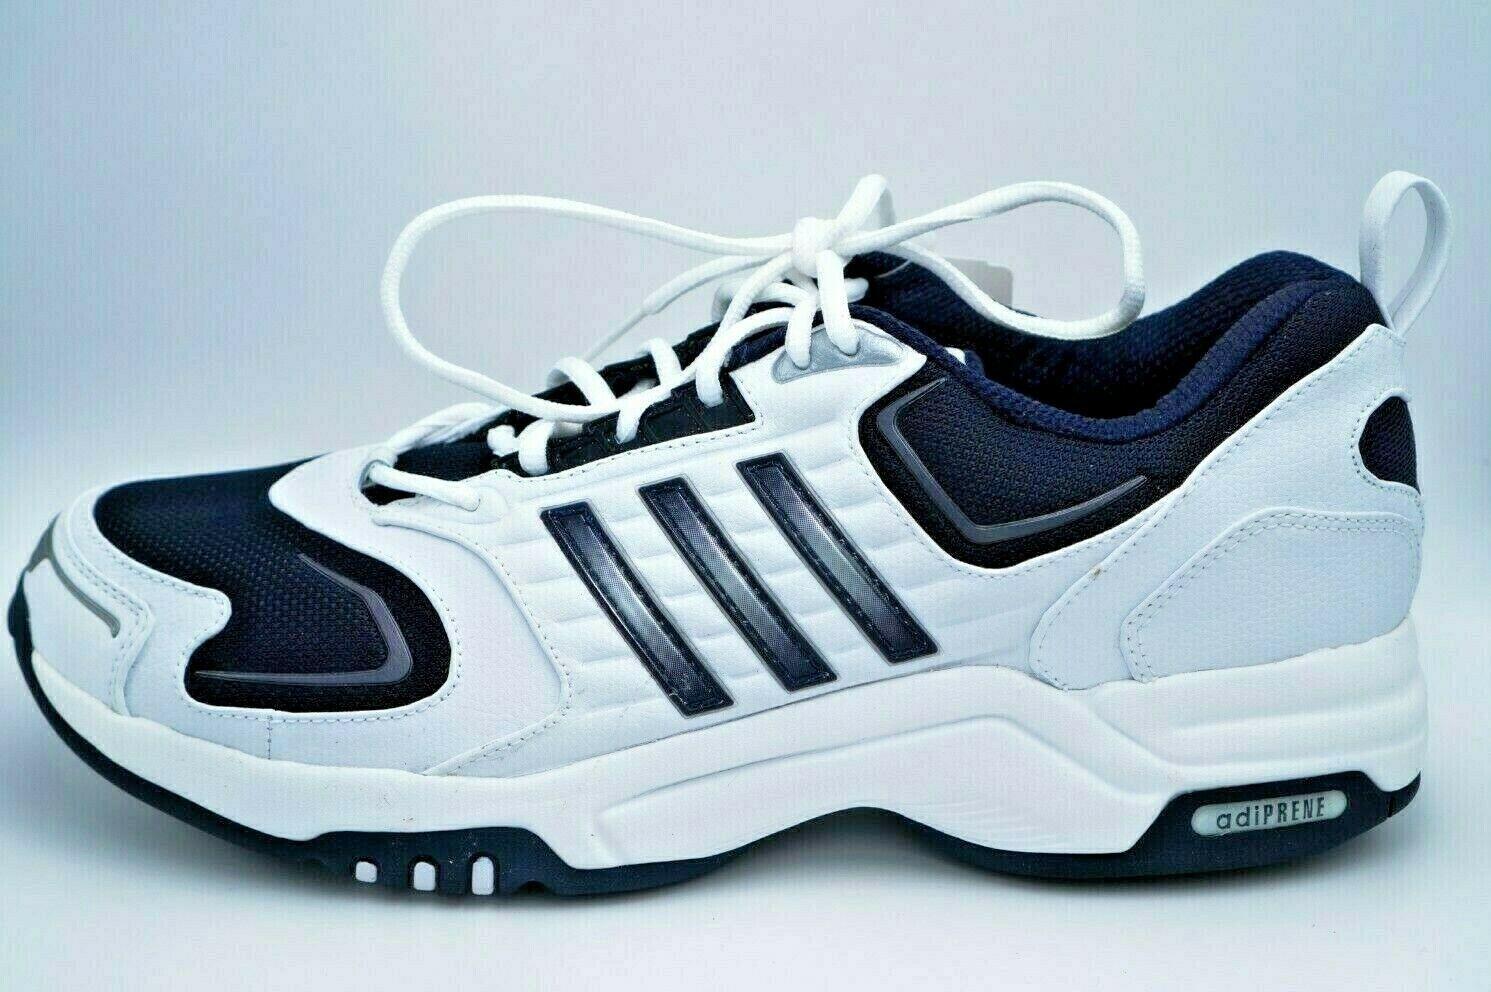 ad5037b897849 Rare Adidas Adiprene Fast Track LE Navy   White Training Training Training  shoes 11 U.S New